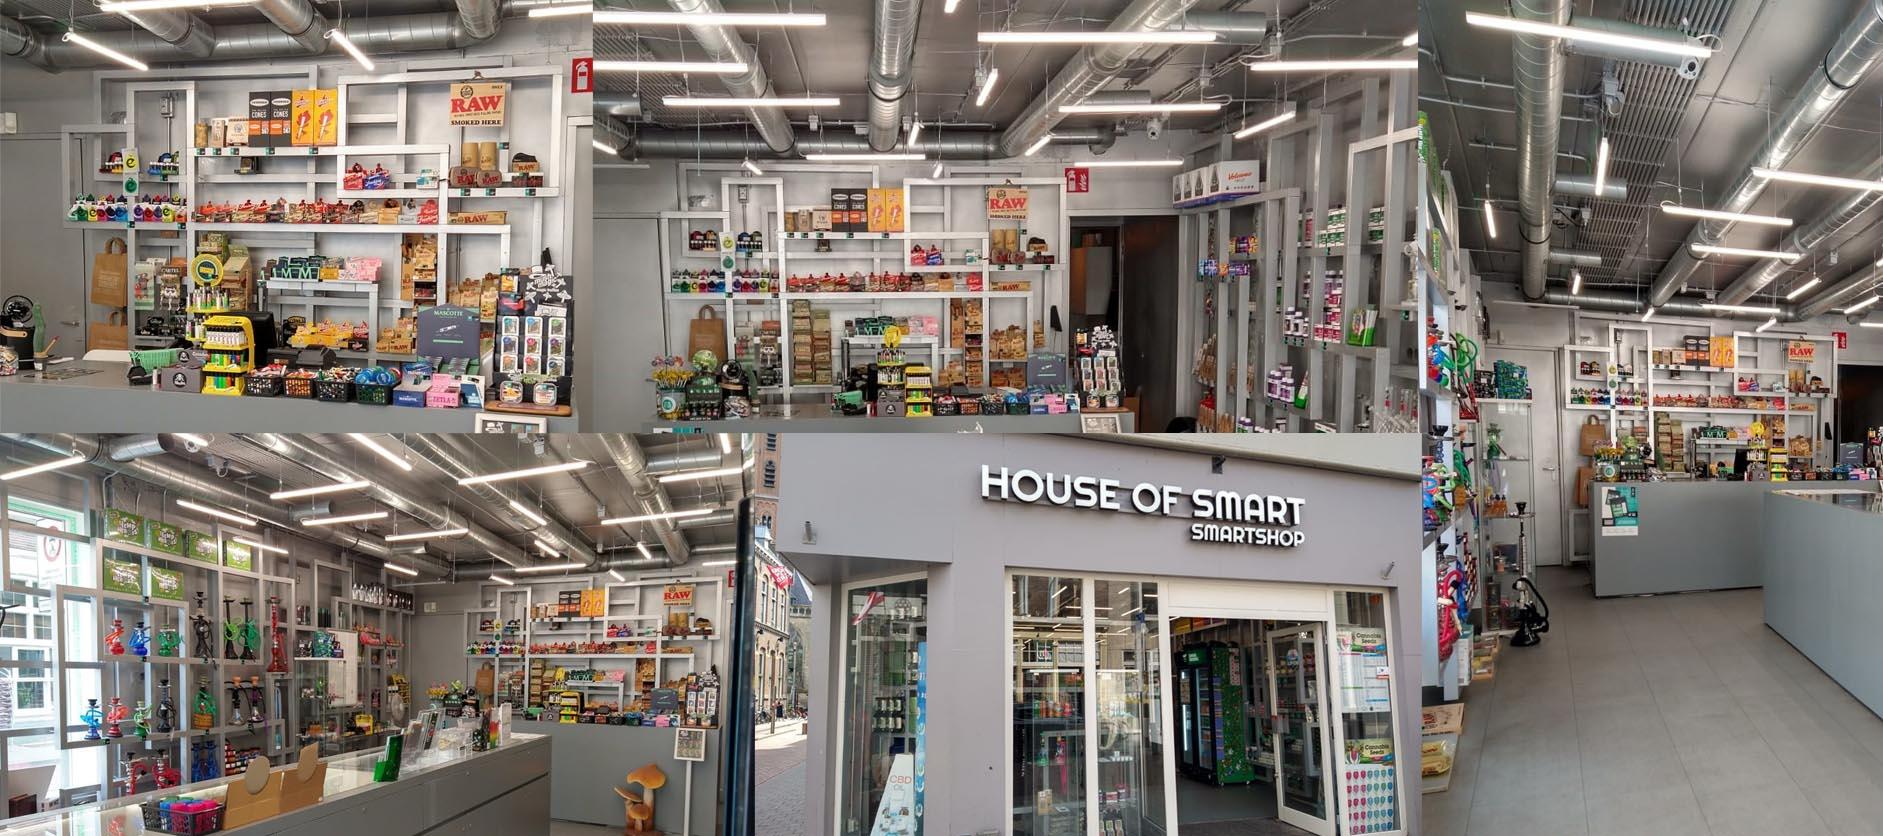 House of smart slider Den Bosch